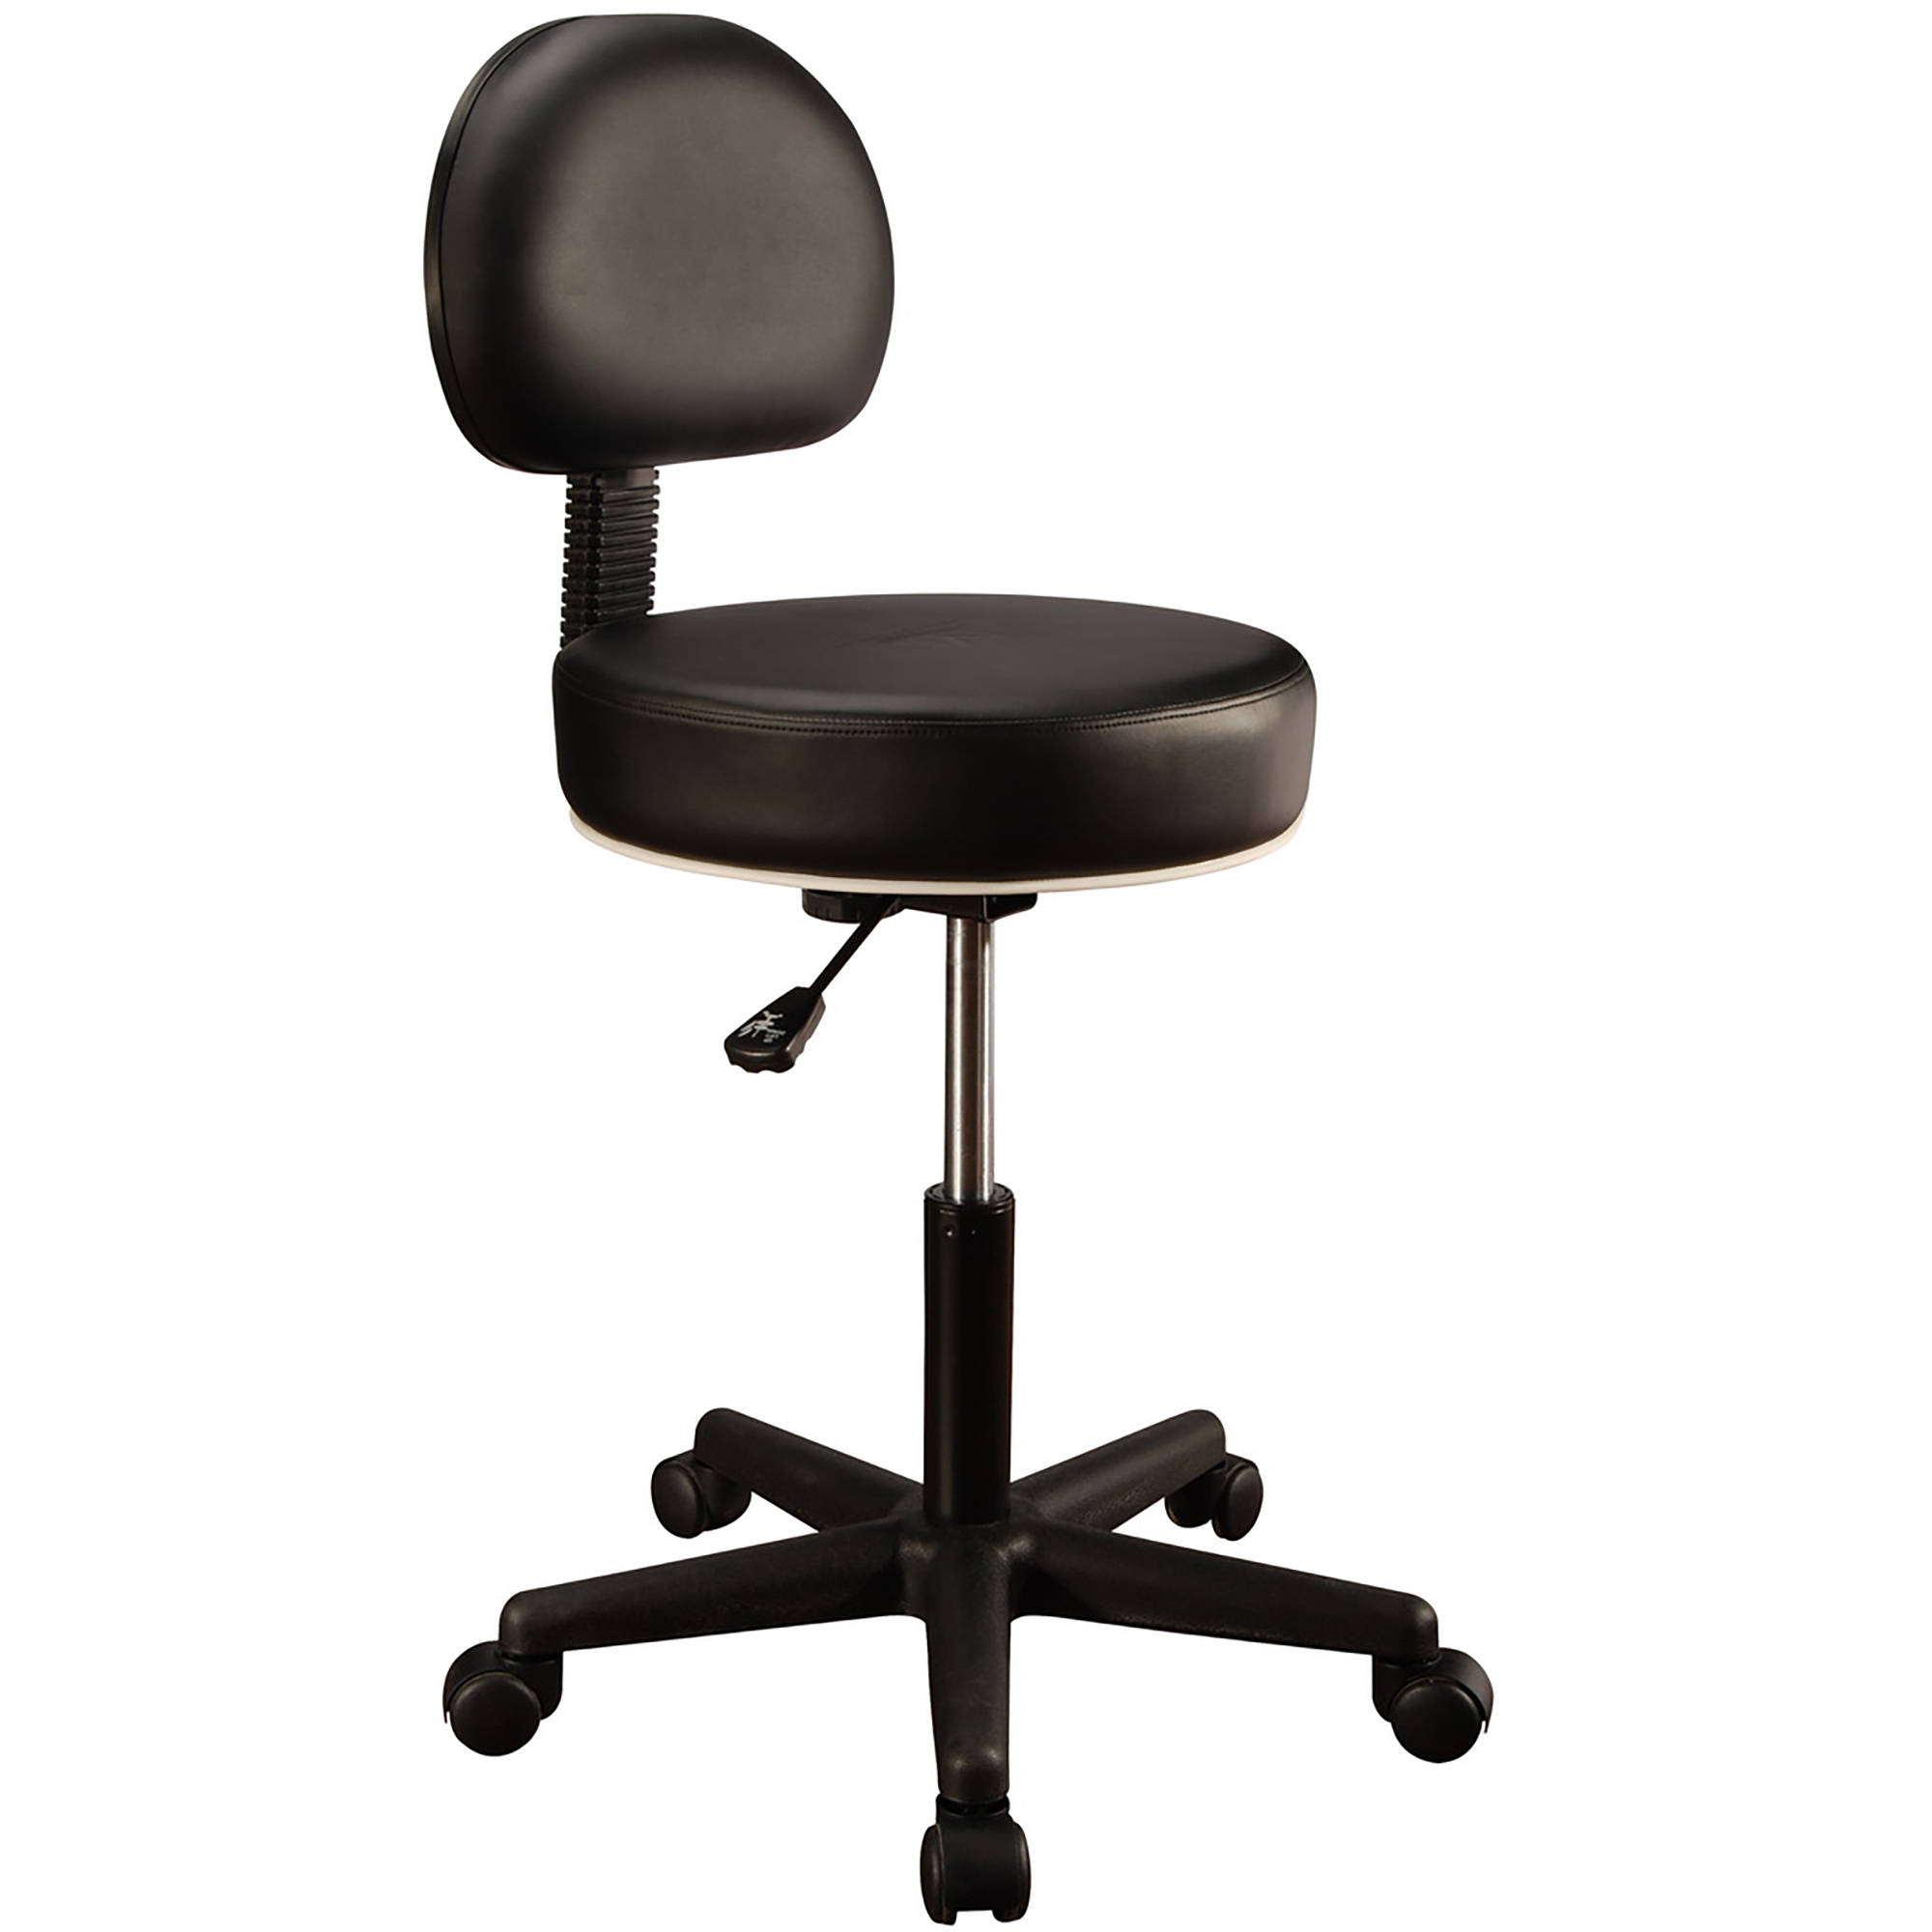 MT Massage Backrest Stool